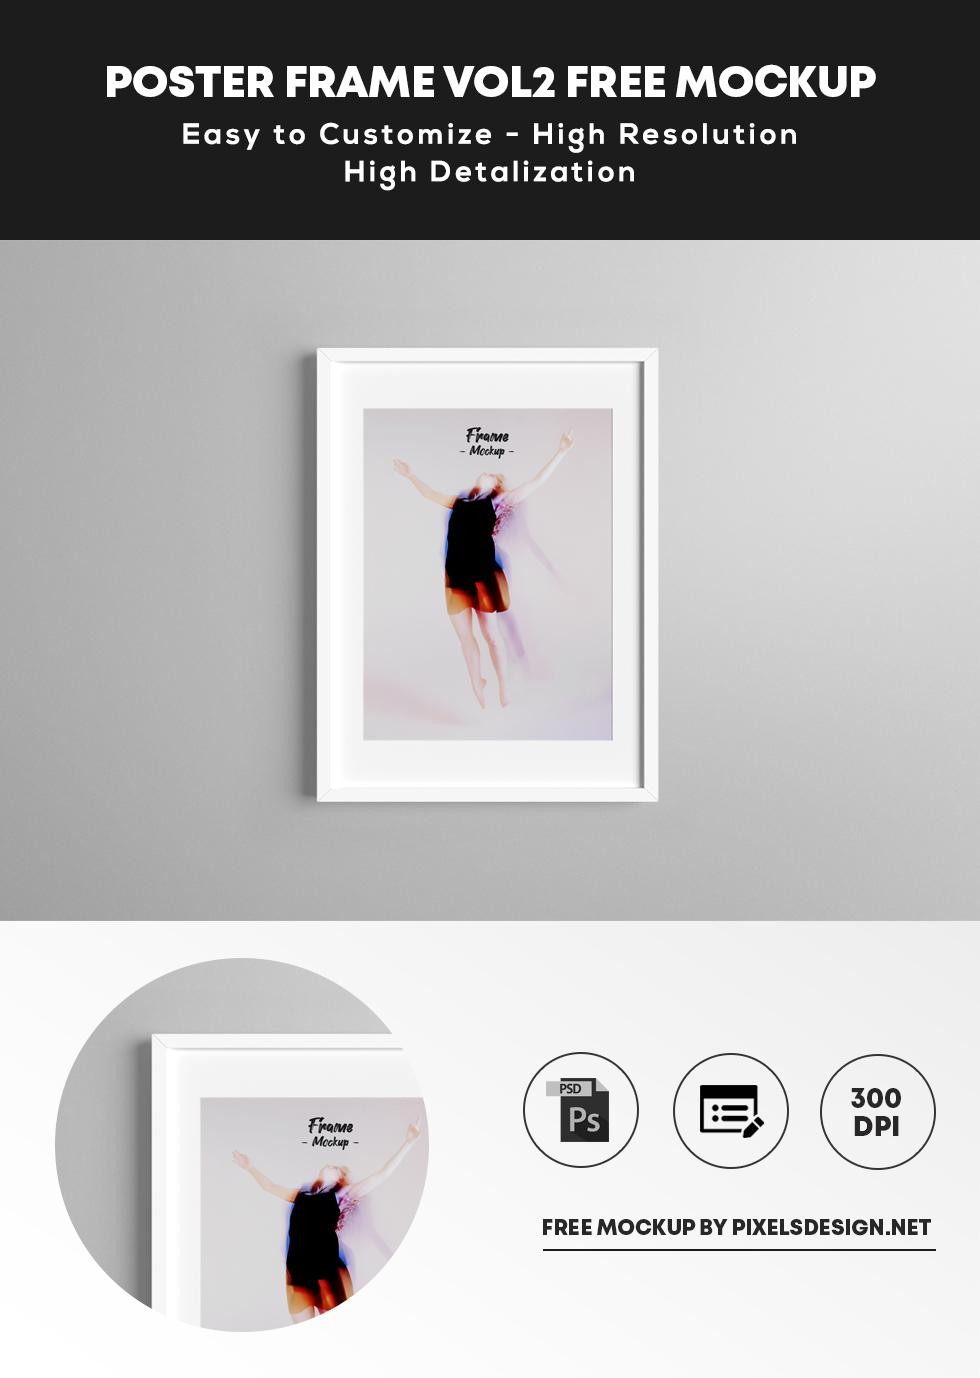 Free Poster Frame vol2 Mockup